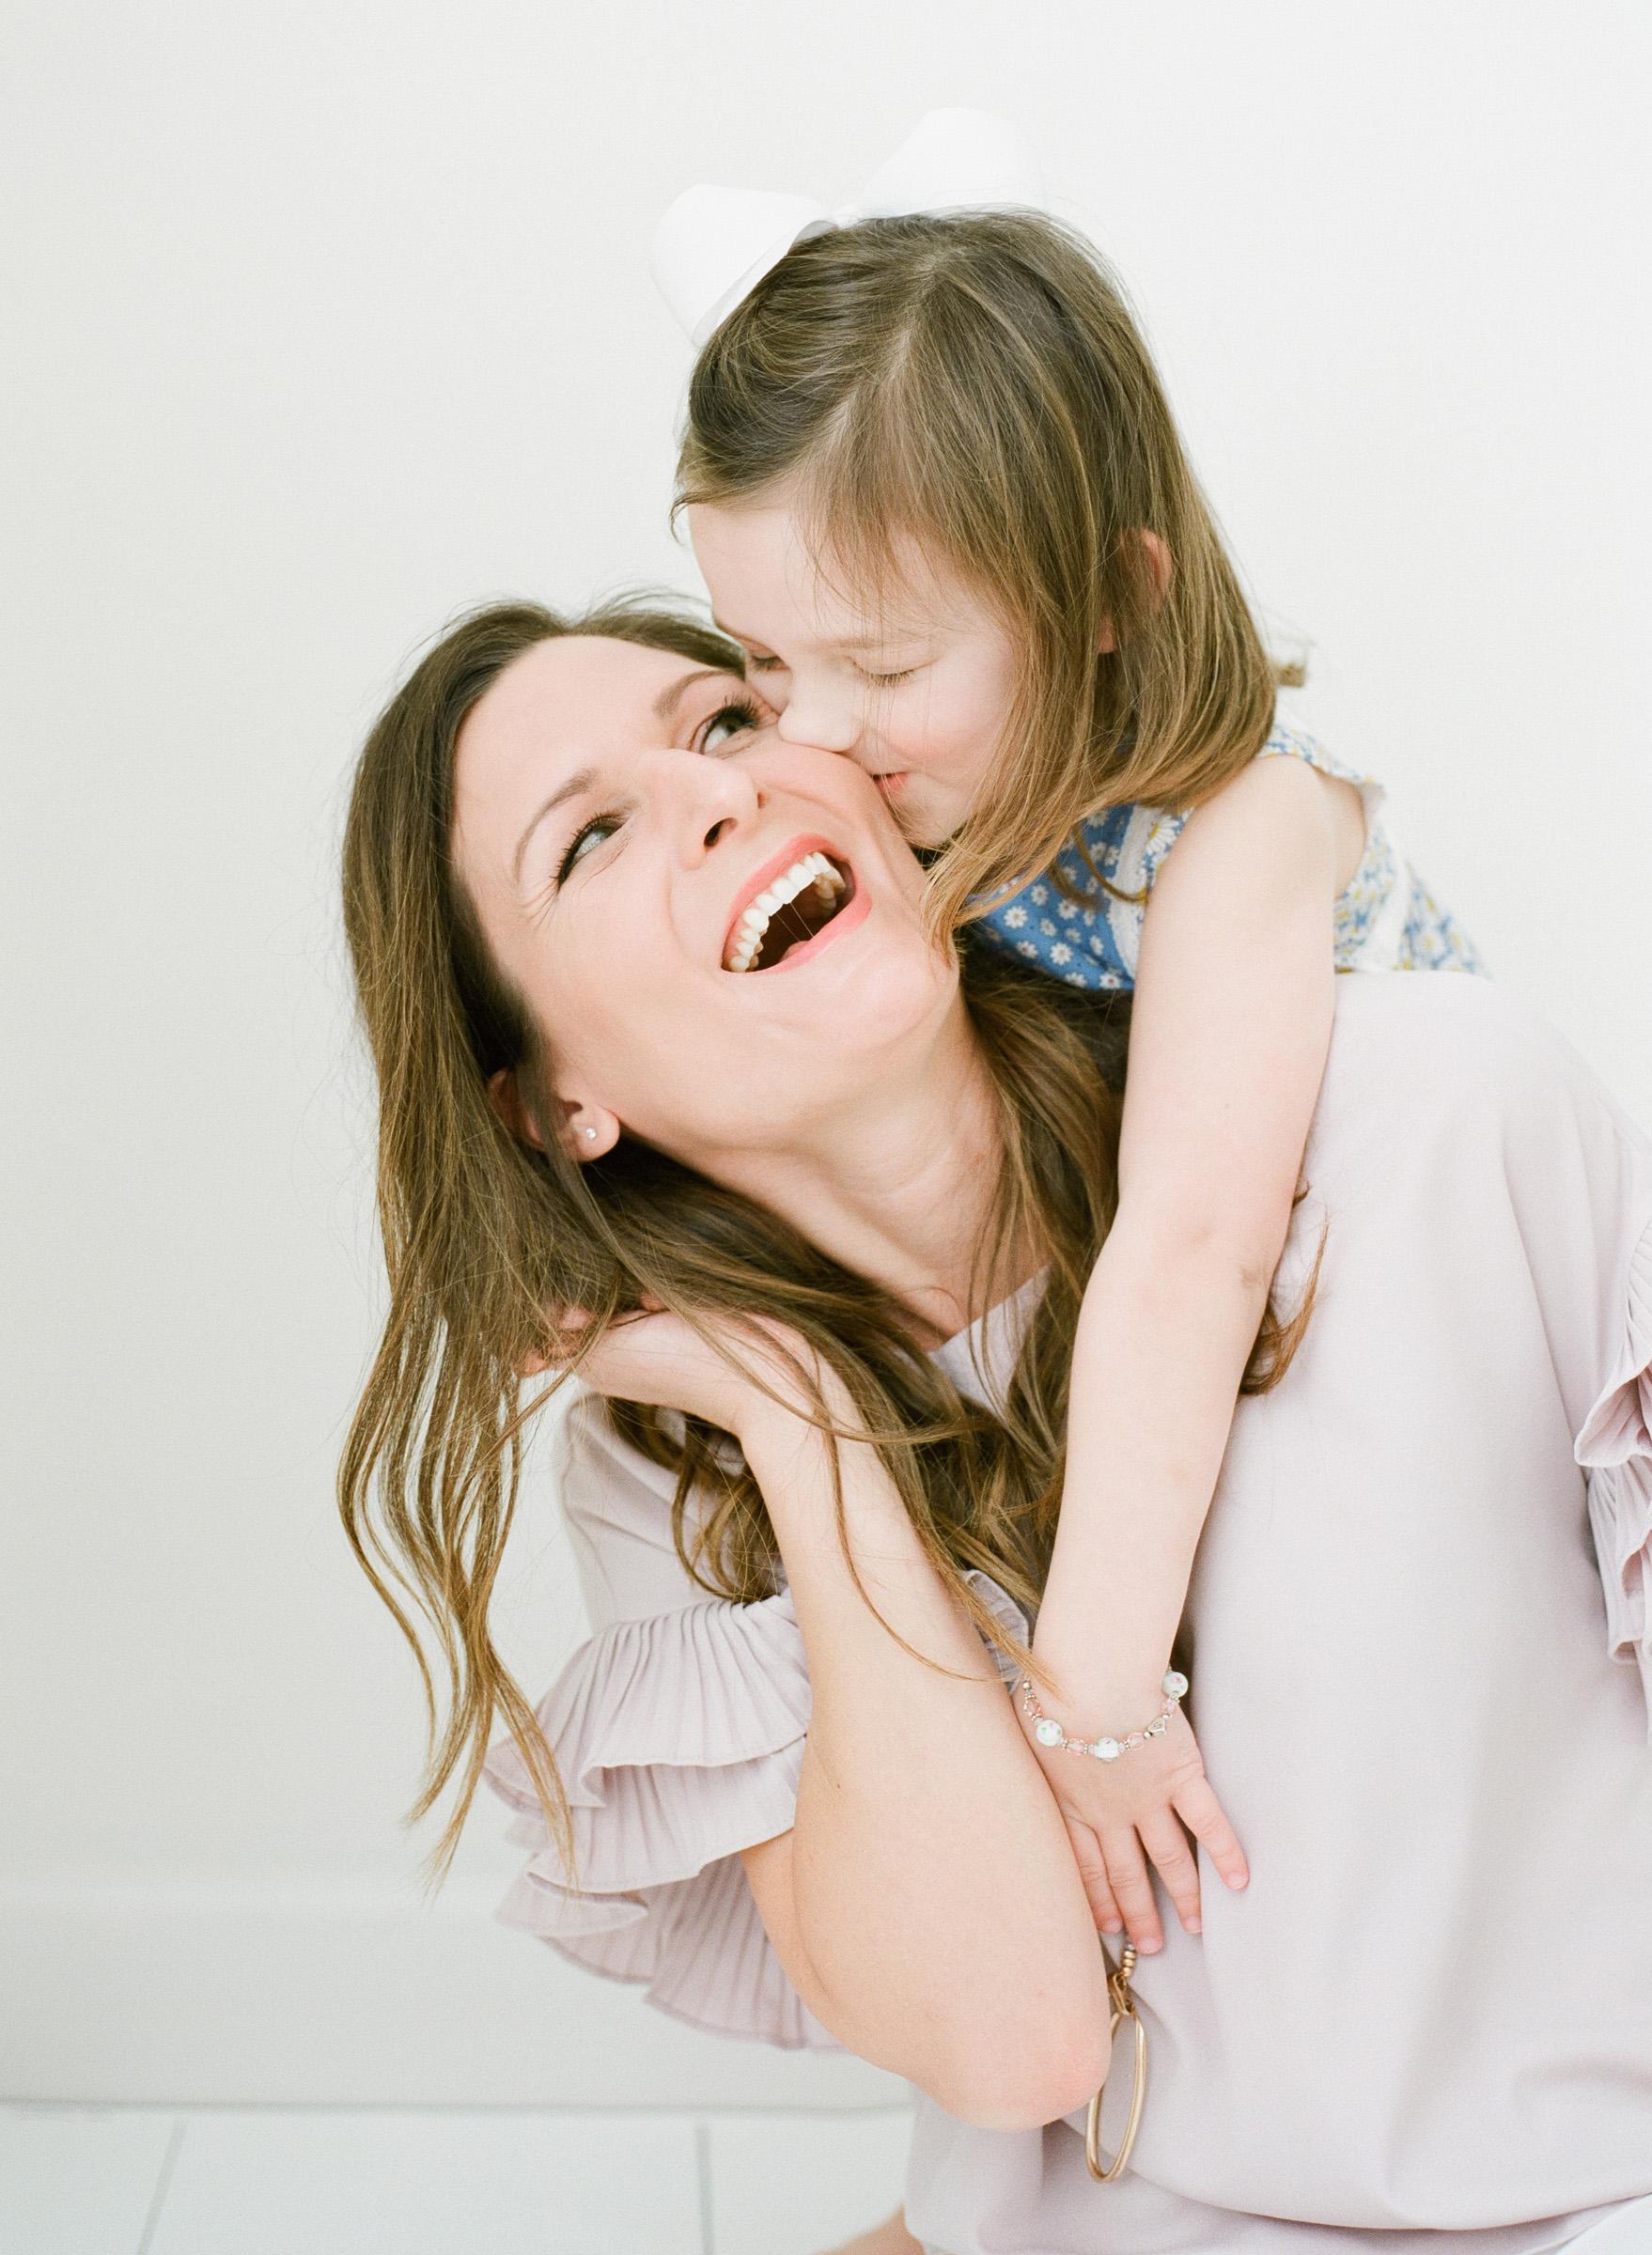 raleigh-studio-family-film-photographer-baby-milestone-photos